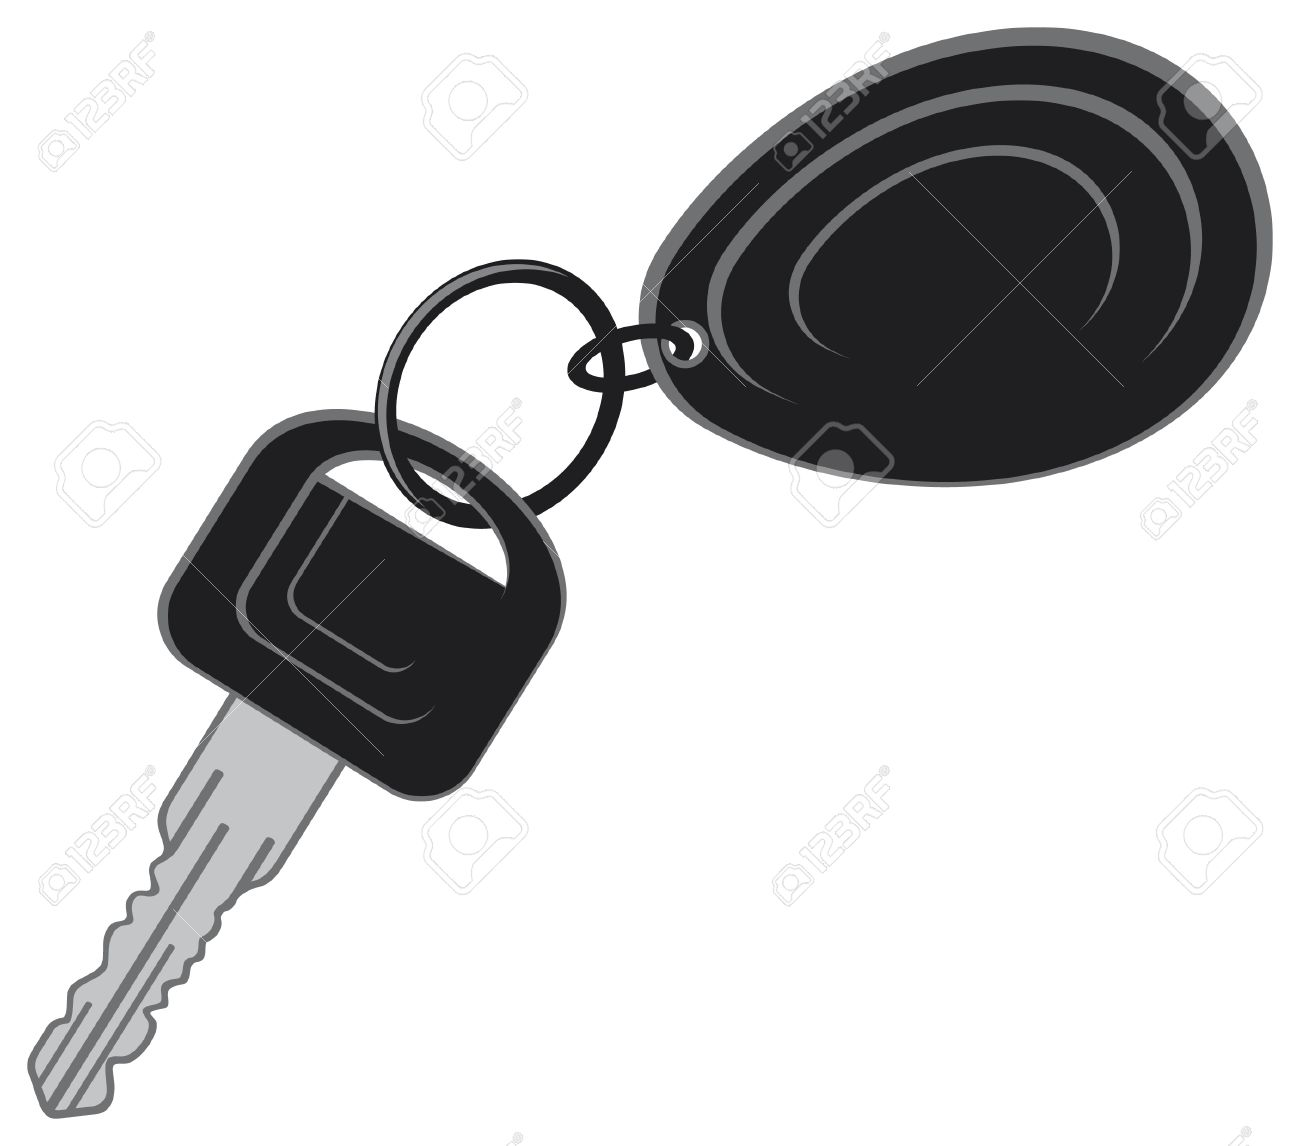 Car key clipart.